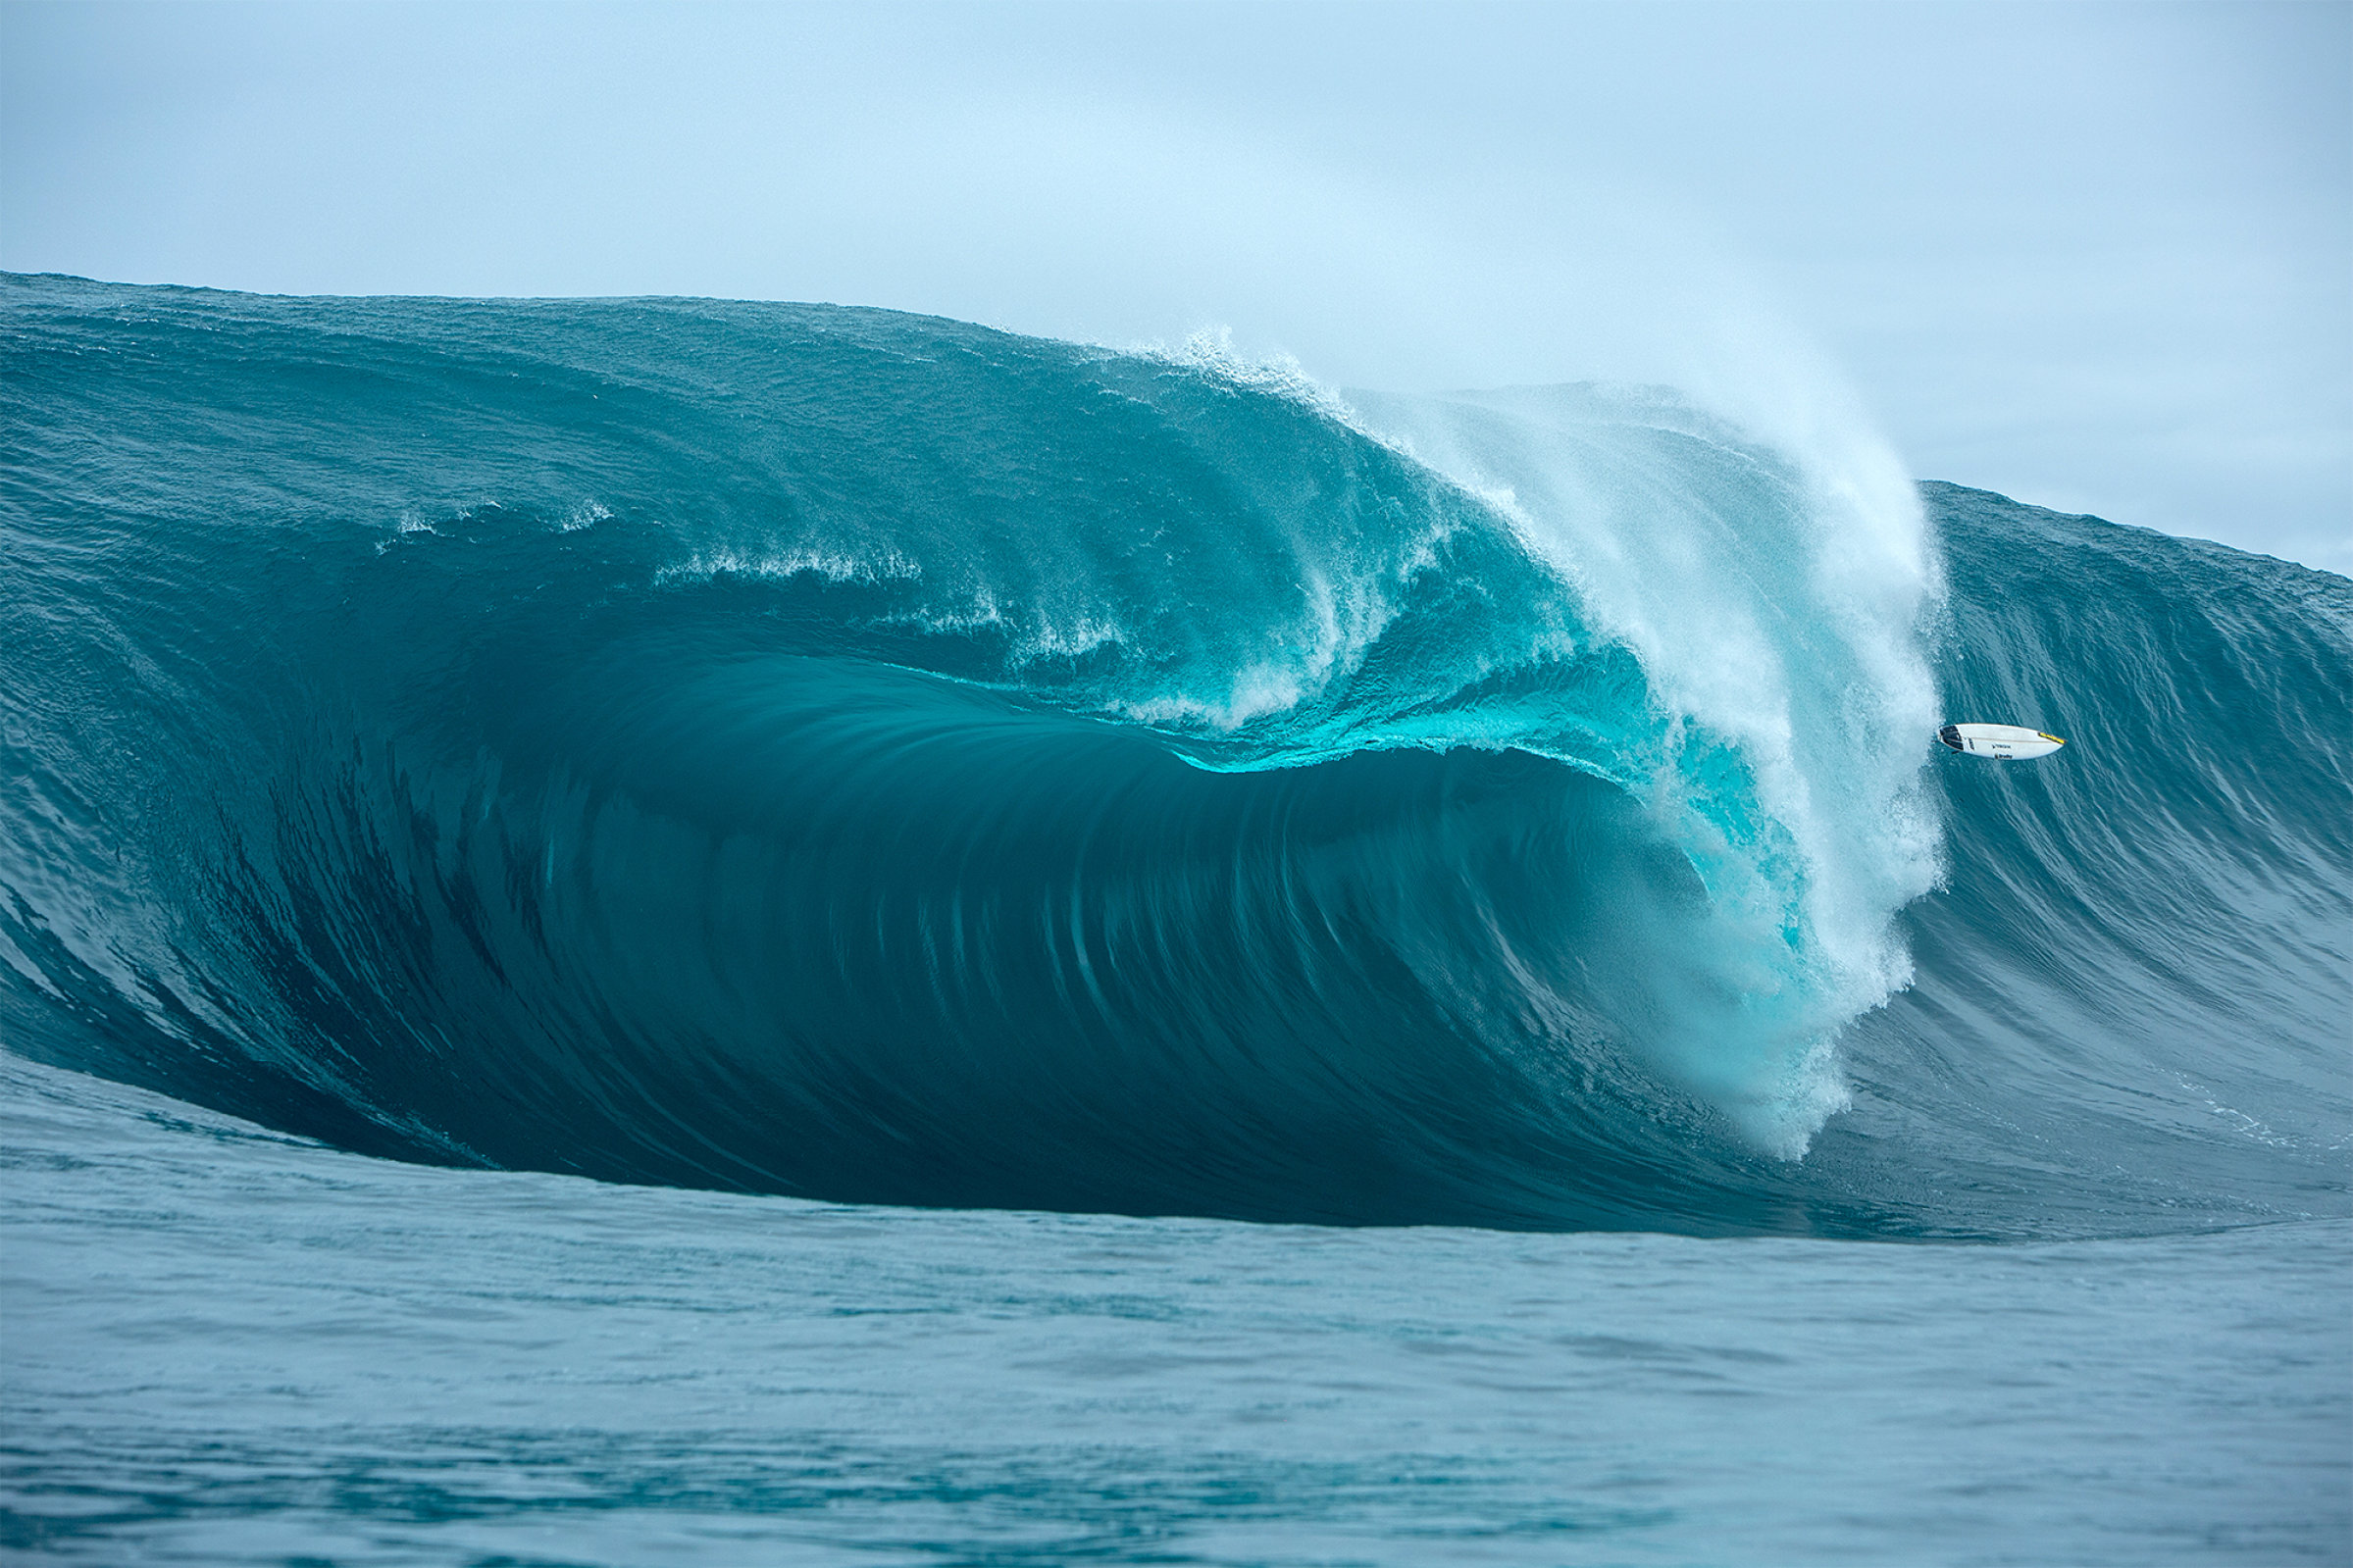 Bagno Lillatro : Lillatro surf report forecast surfline